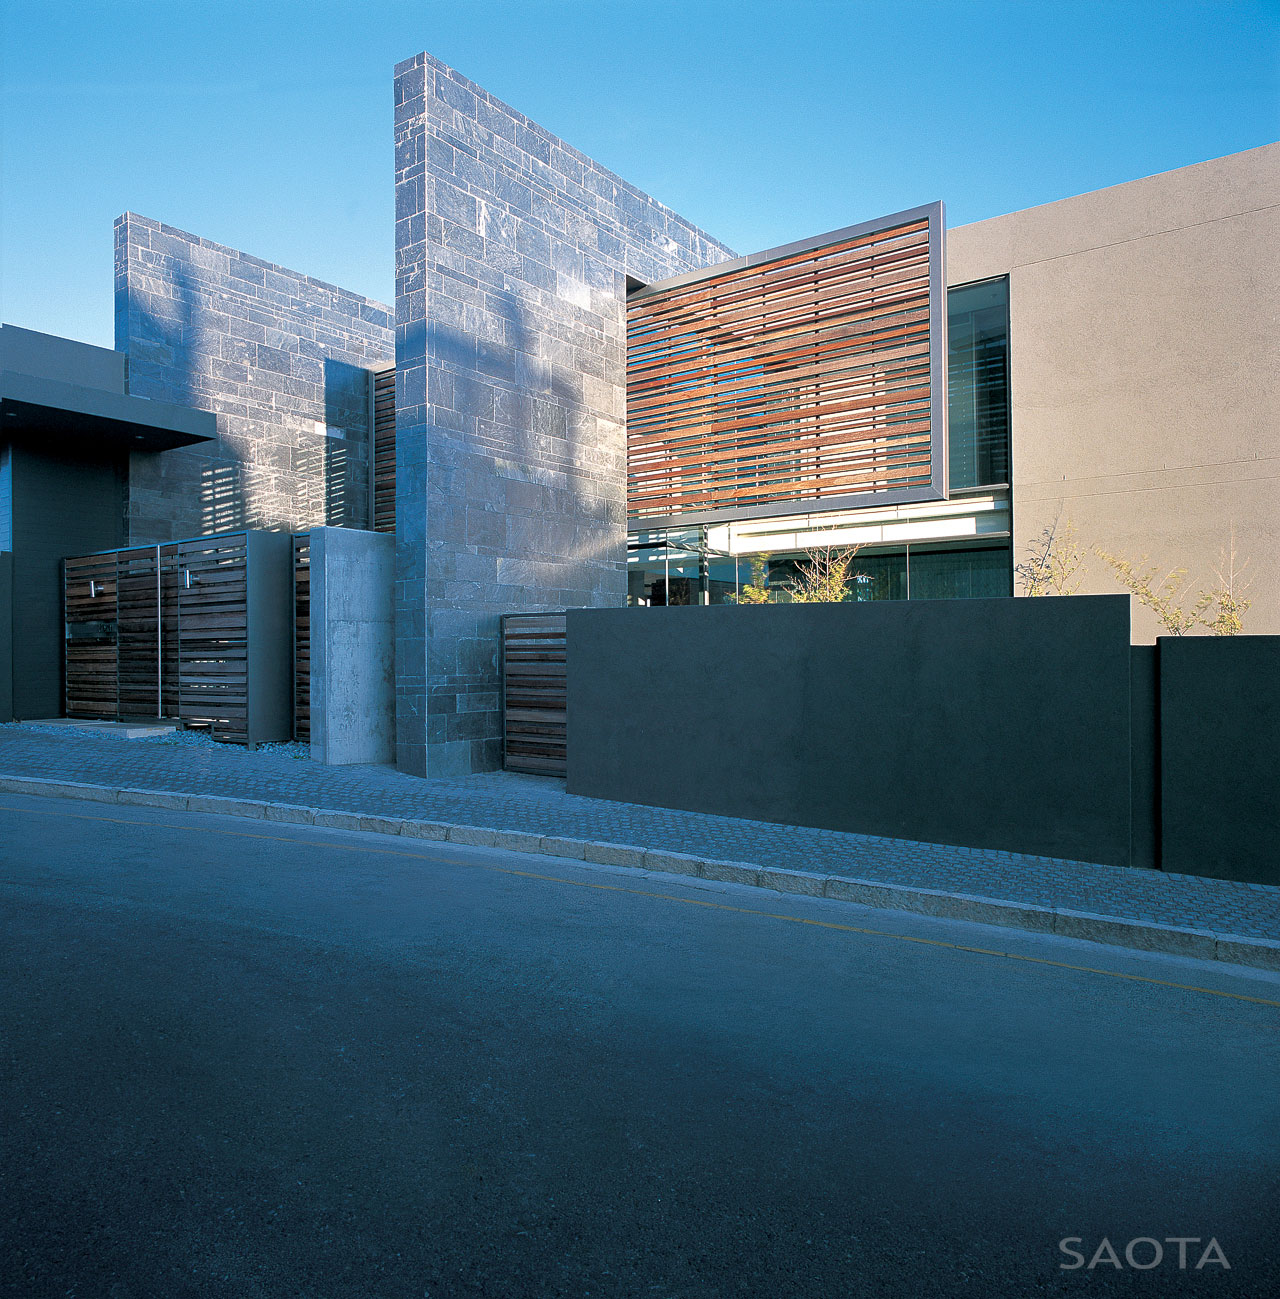 St Leon 10 by SAOTA and Antoni Associates